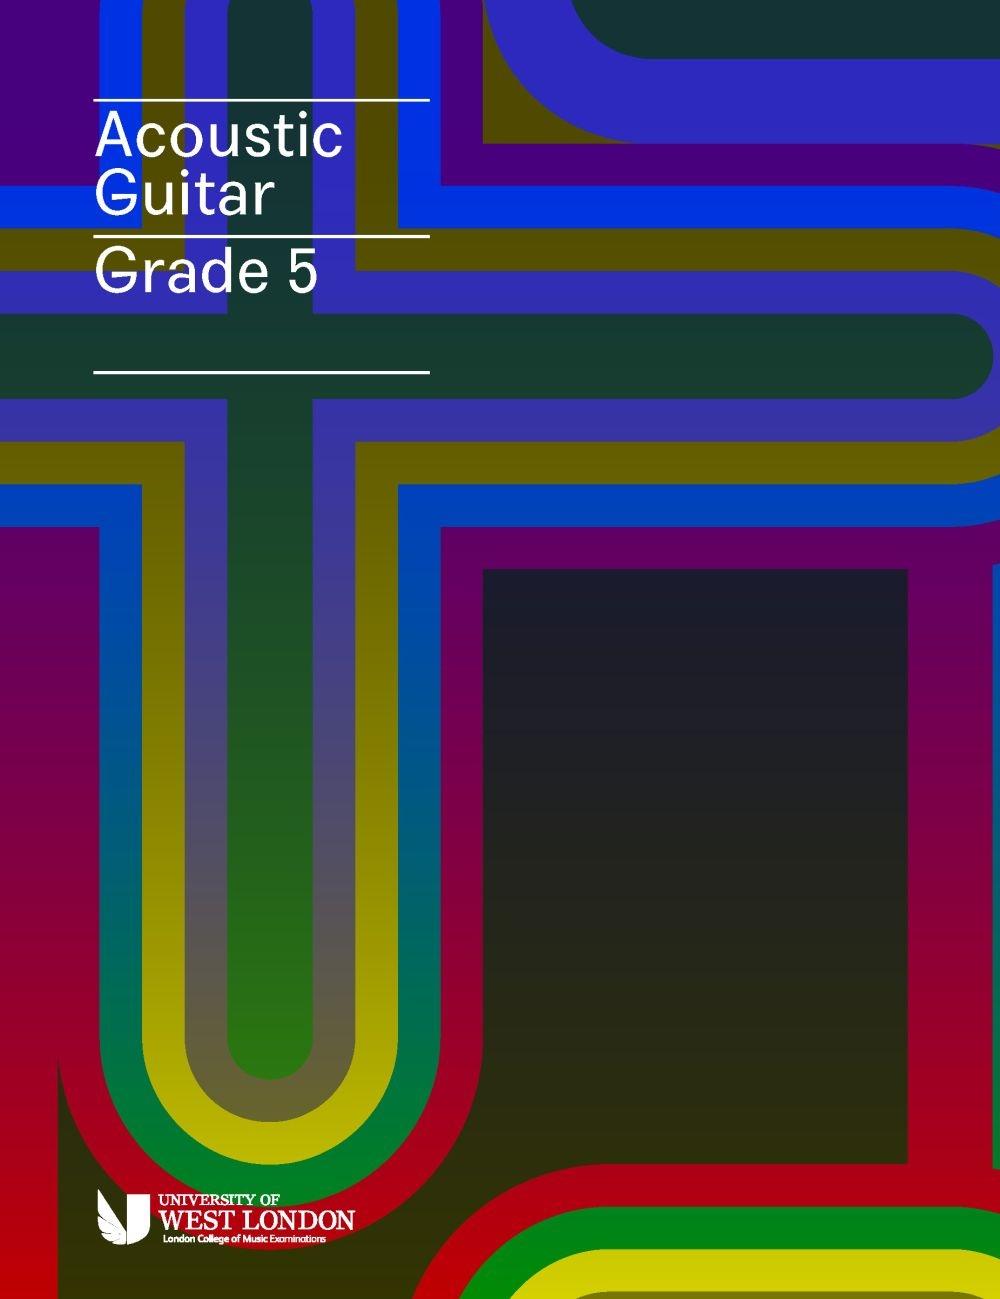 LCM Acoustic Guitar Handbook Grade 5 2020: Acoustic Guitar: Instrumental Tutor